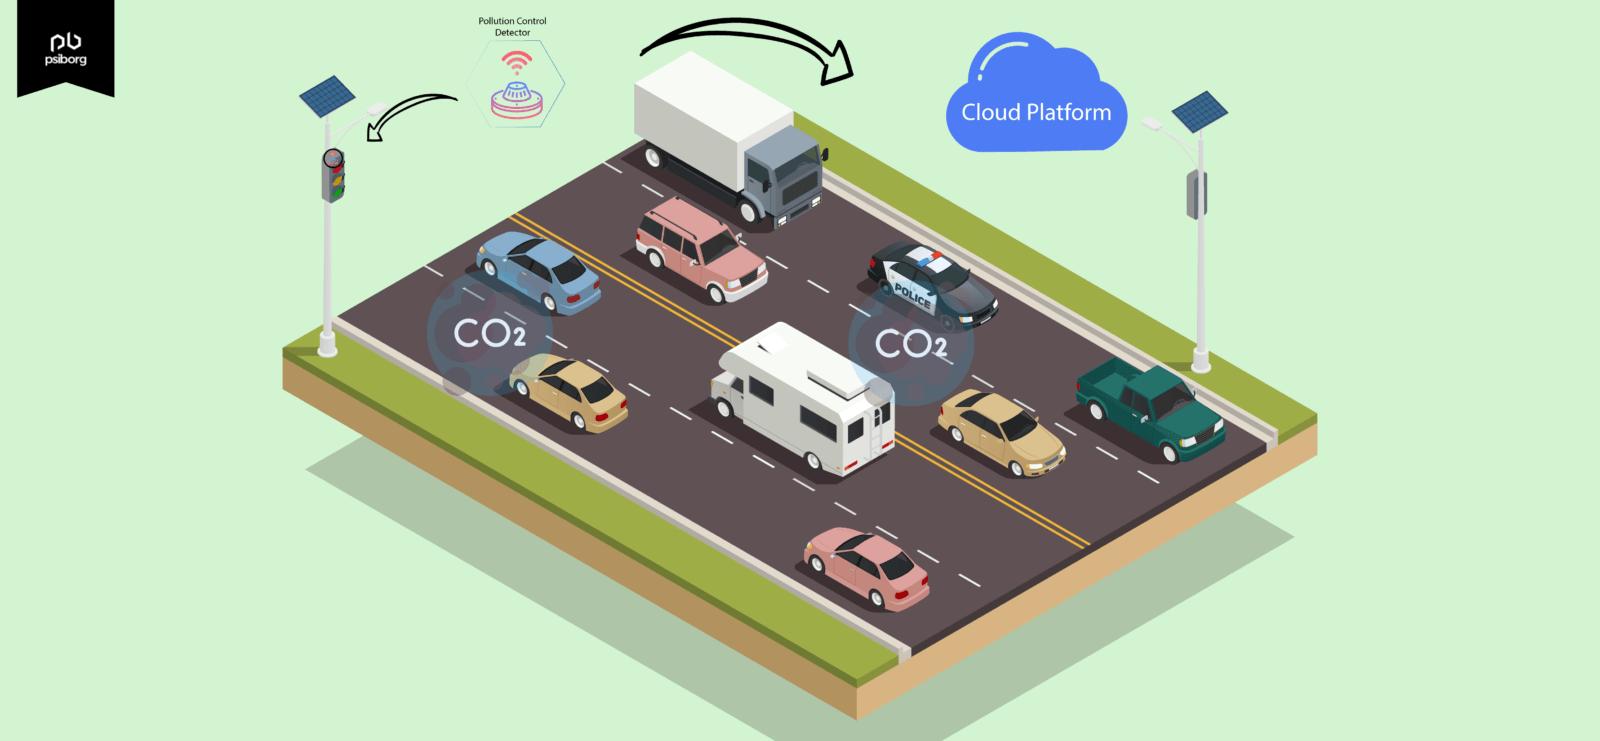 Air Quality monitoring using IoT